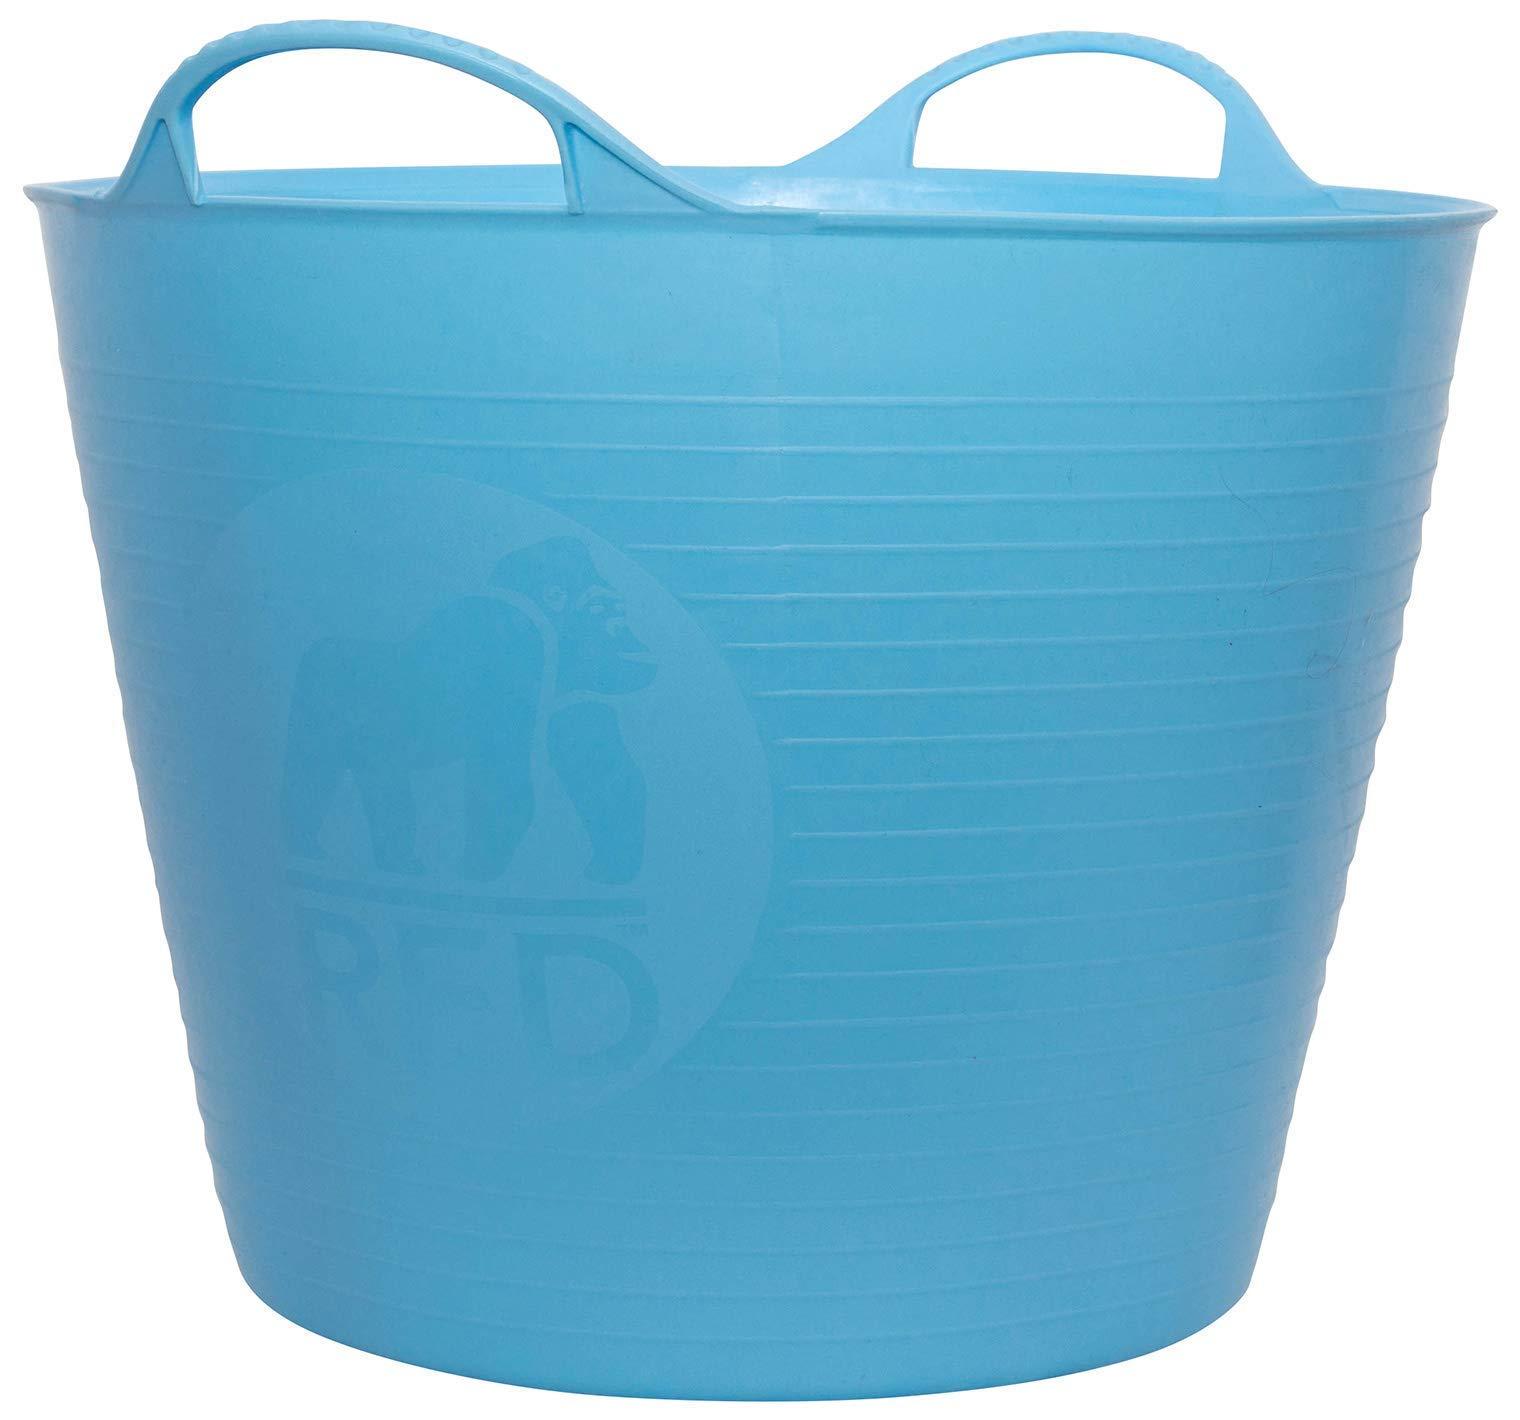 Faulks & Cox Unknown Tubtrugs 26L Medium Flexible 2-Handled Recycled Tub, Sky Blue, 26 liters, 6.5 gallon